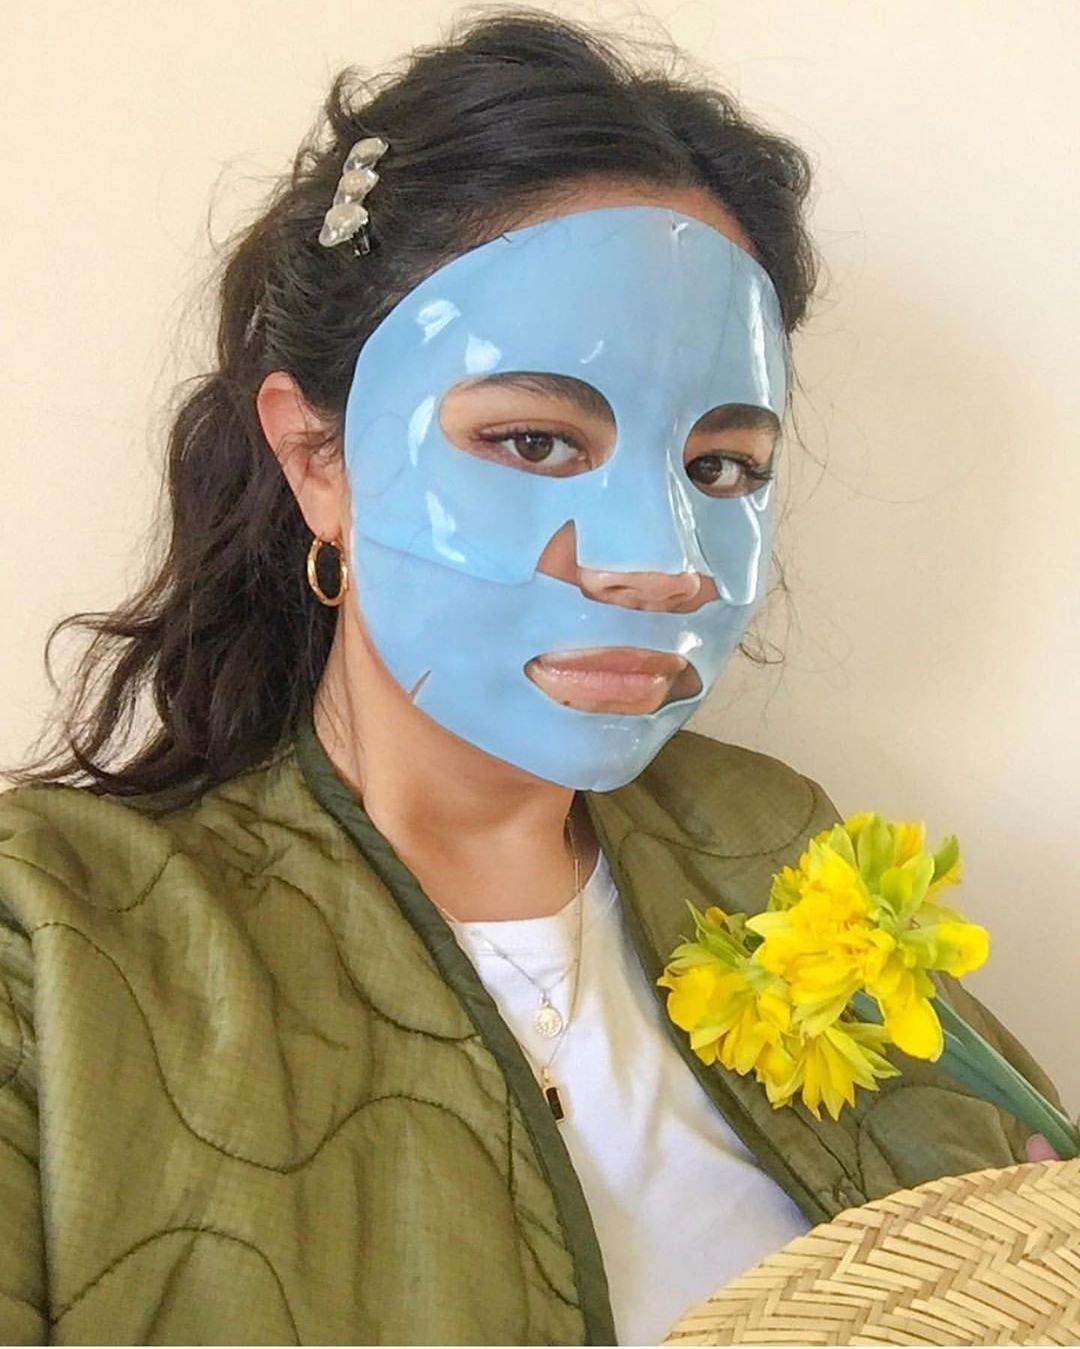 It girl - Jaqueta - Skincare - Inverno - Street Style